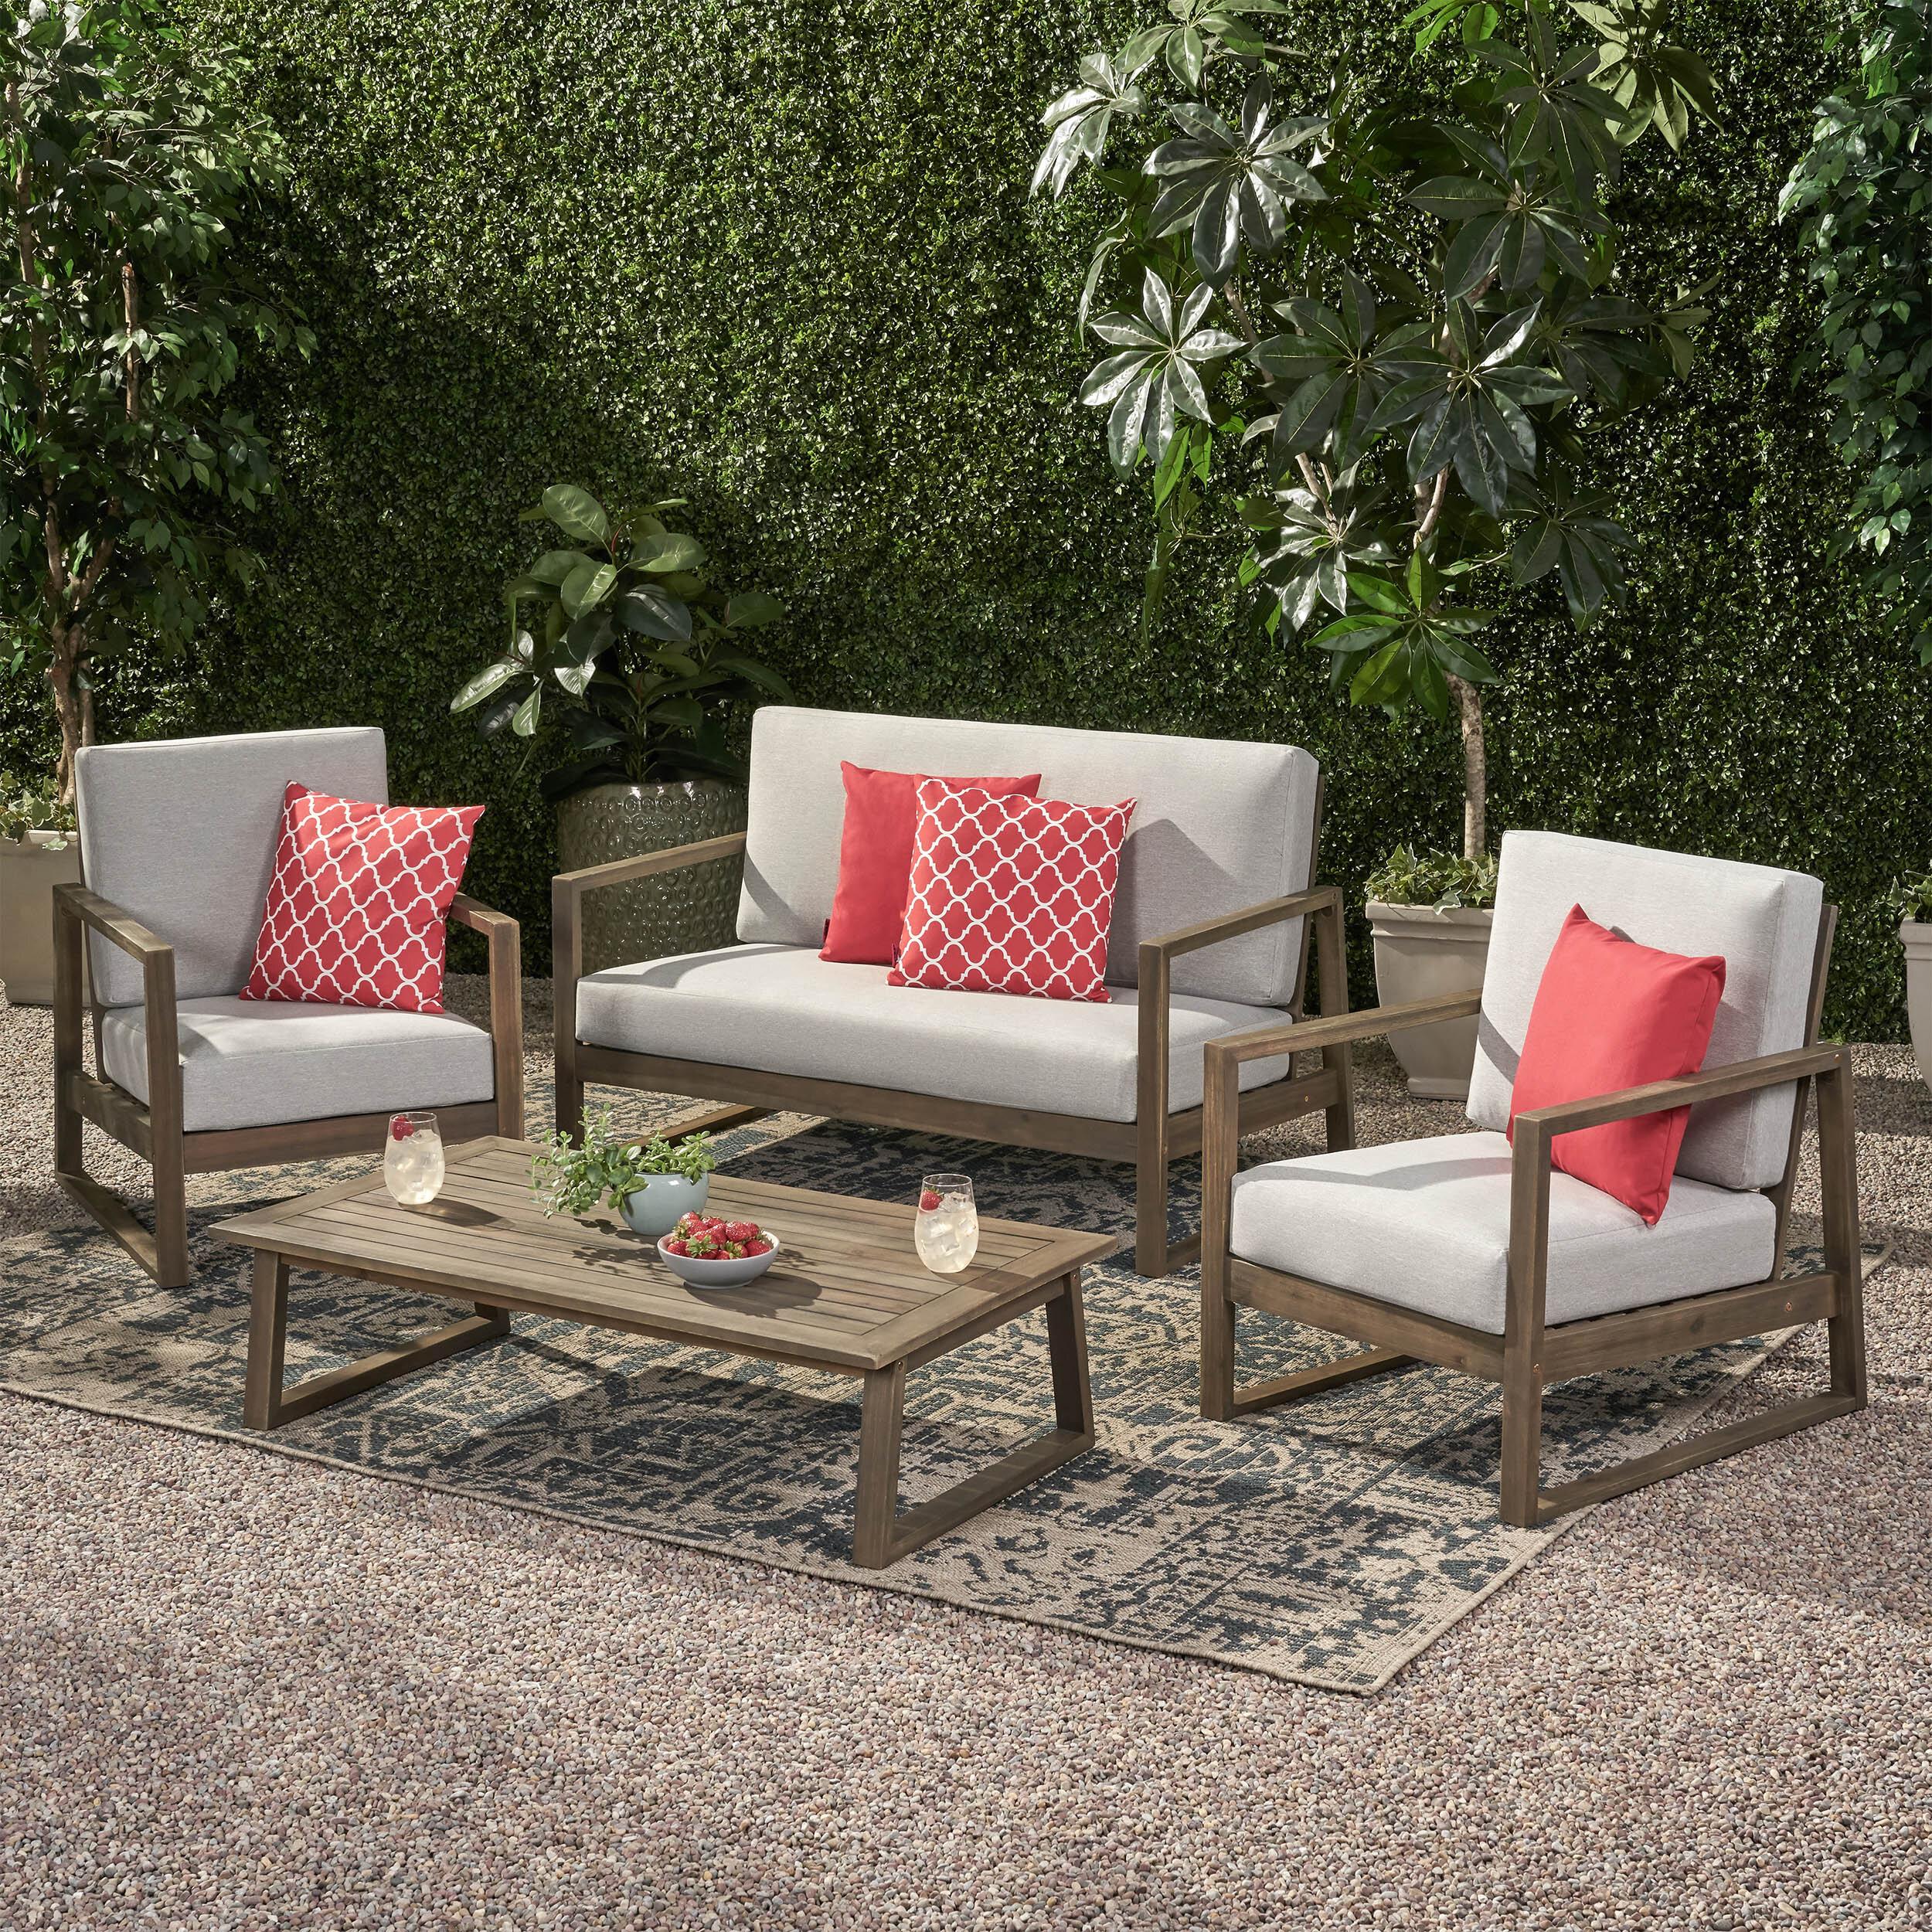 Lounge Deep Seating Mid Century Modern Patio Conversation Sets You Ll Love In 2021 Wayfair